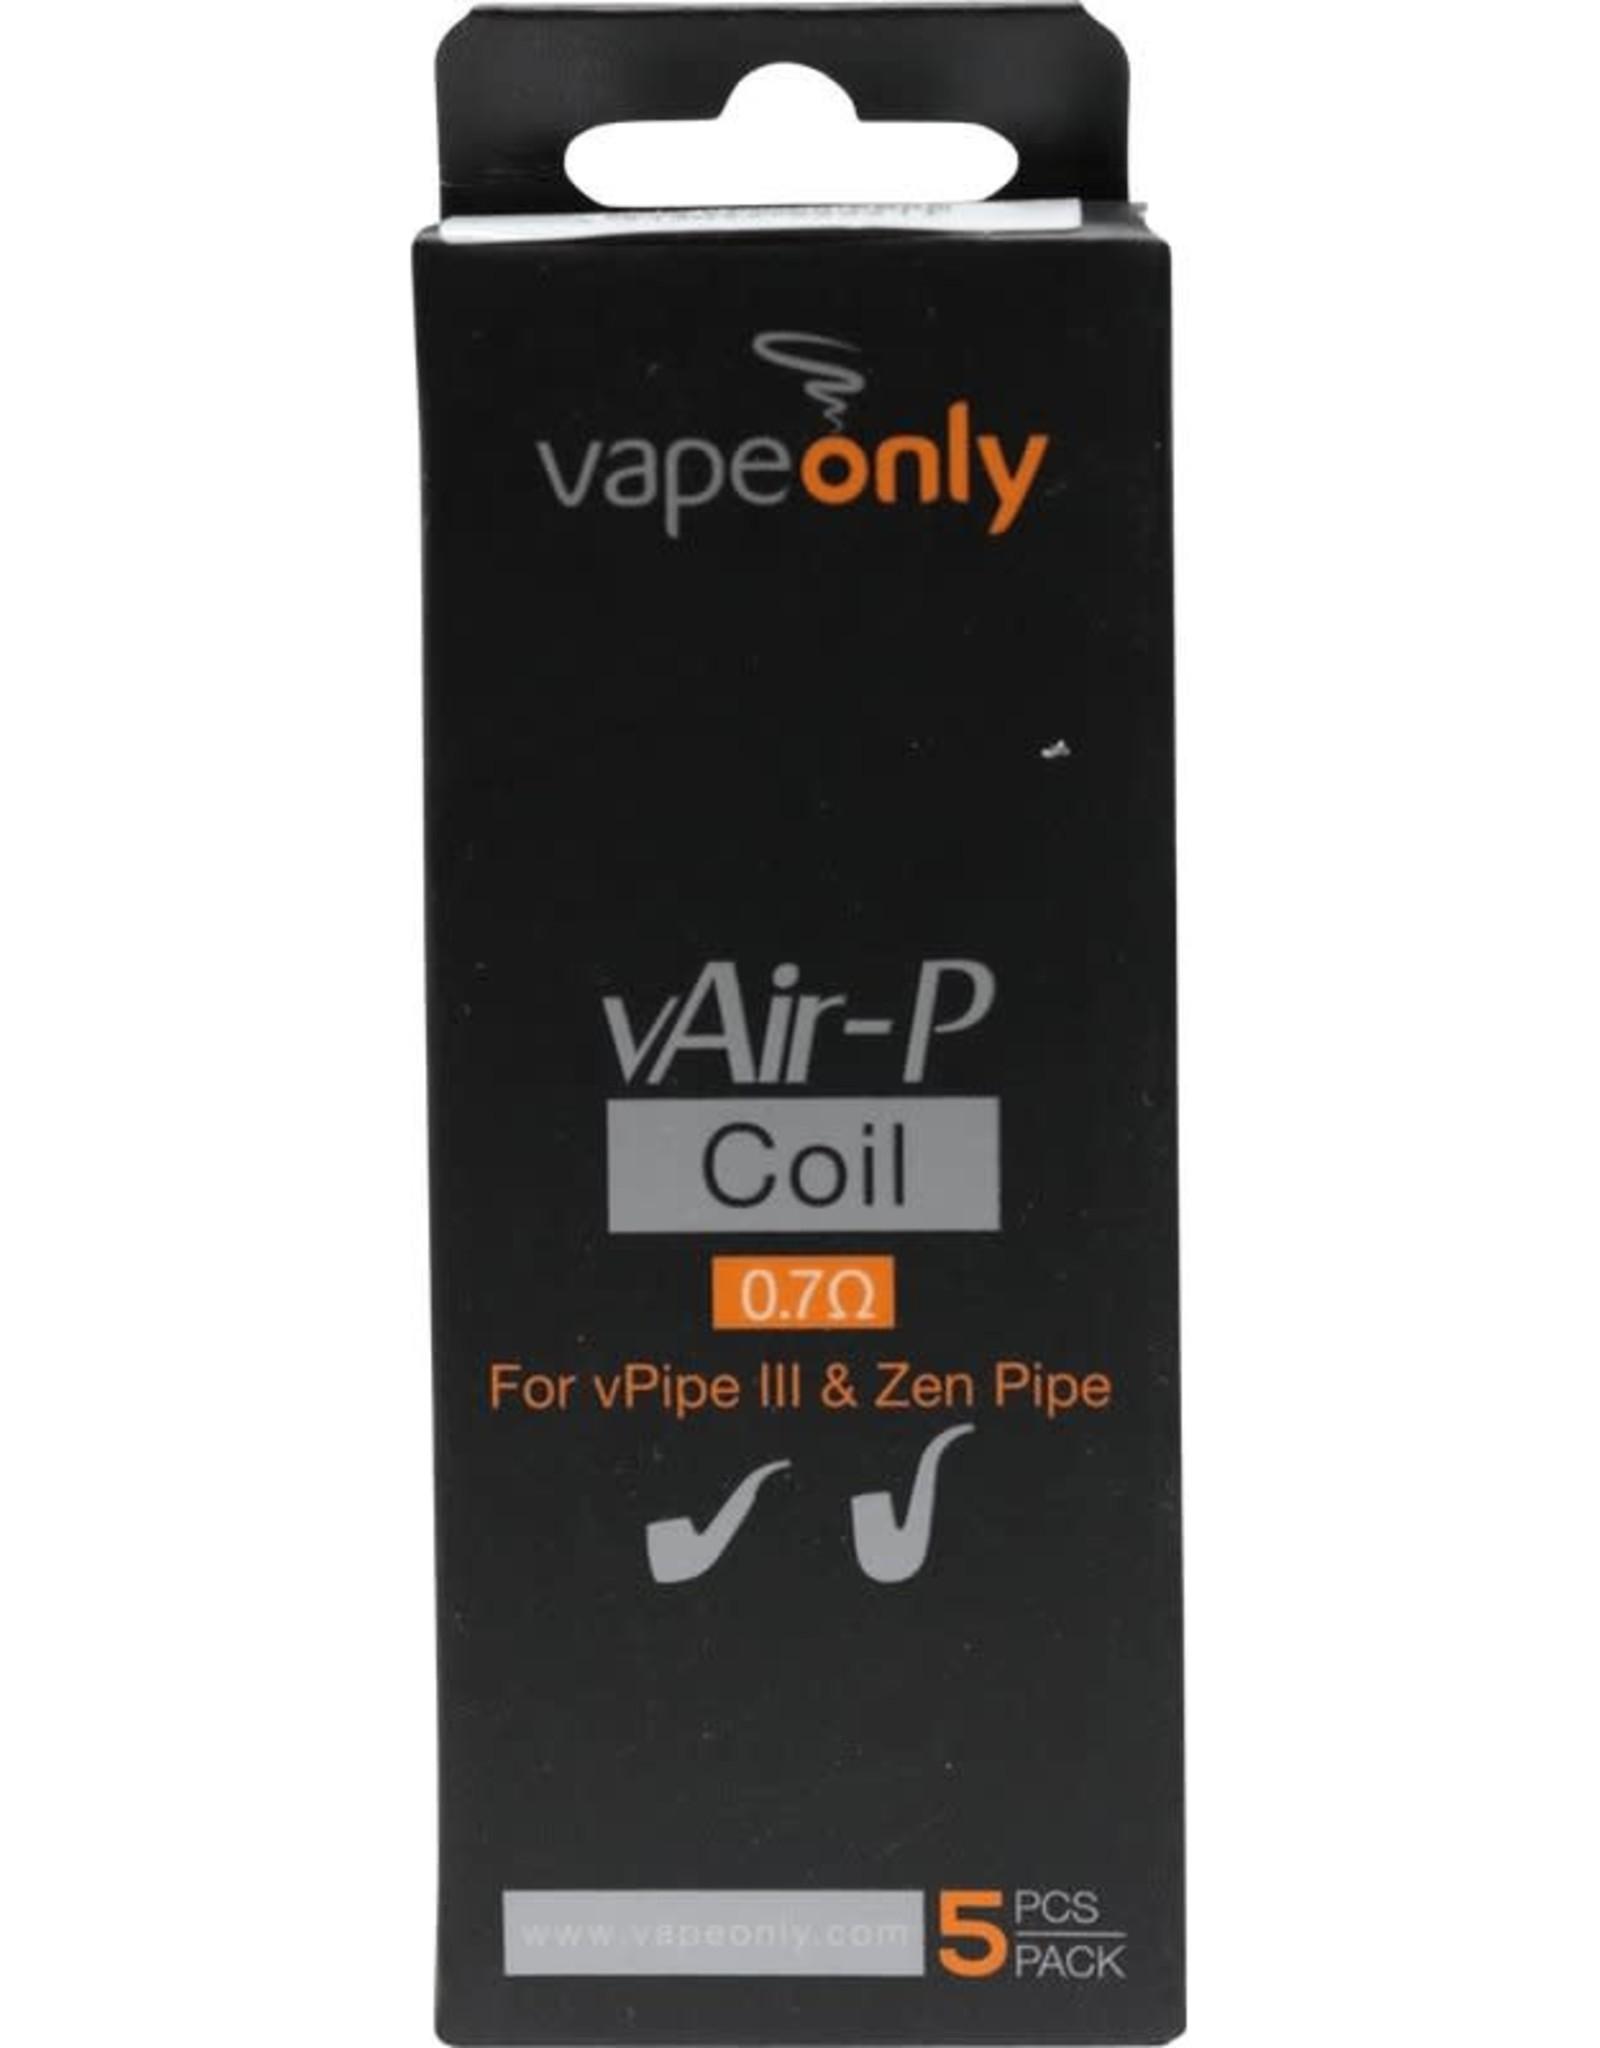 VapeOnly VapeOnly vAir-P Verdampferkopfe